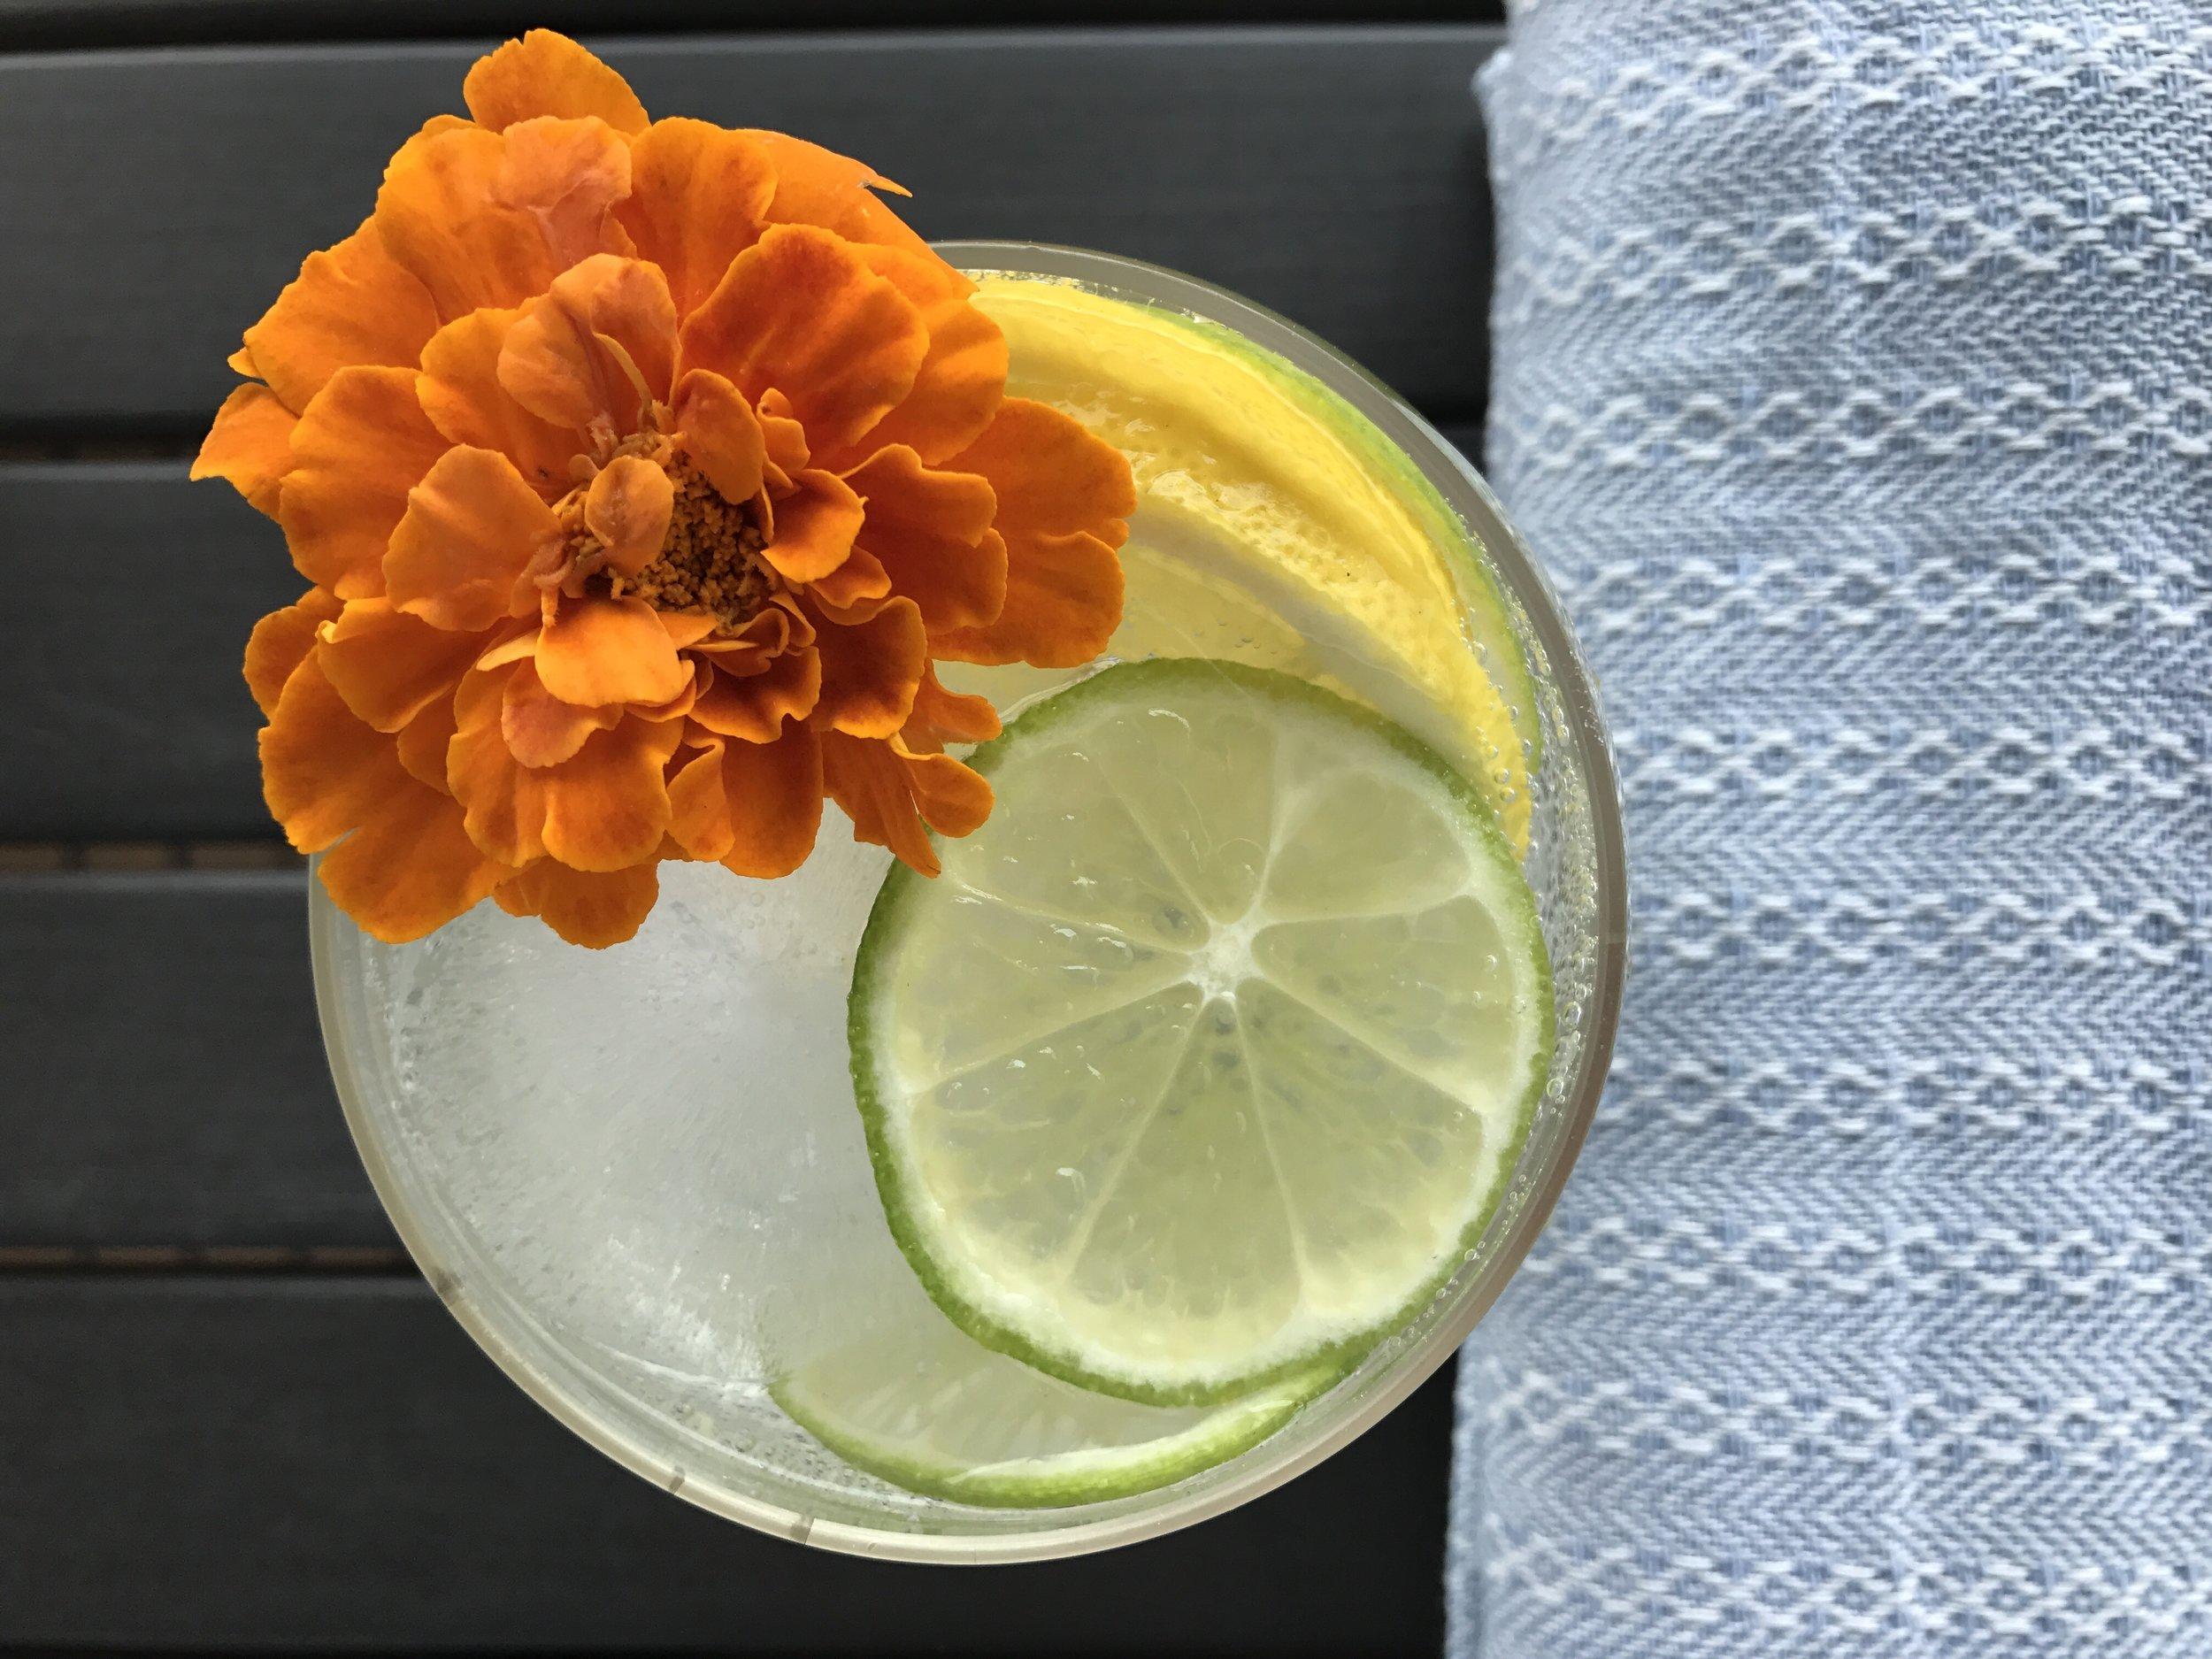 Lemon or lime (or mixed!) La Croix bubbles with freshly sliced lemon & lime.